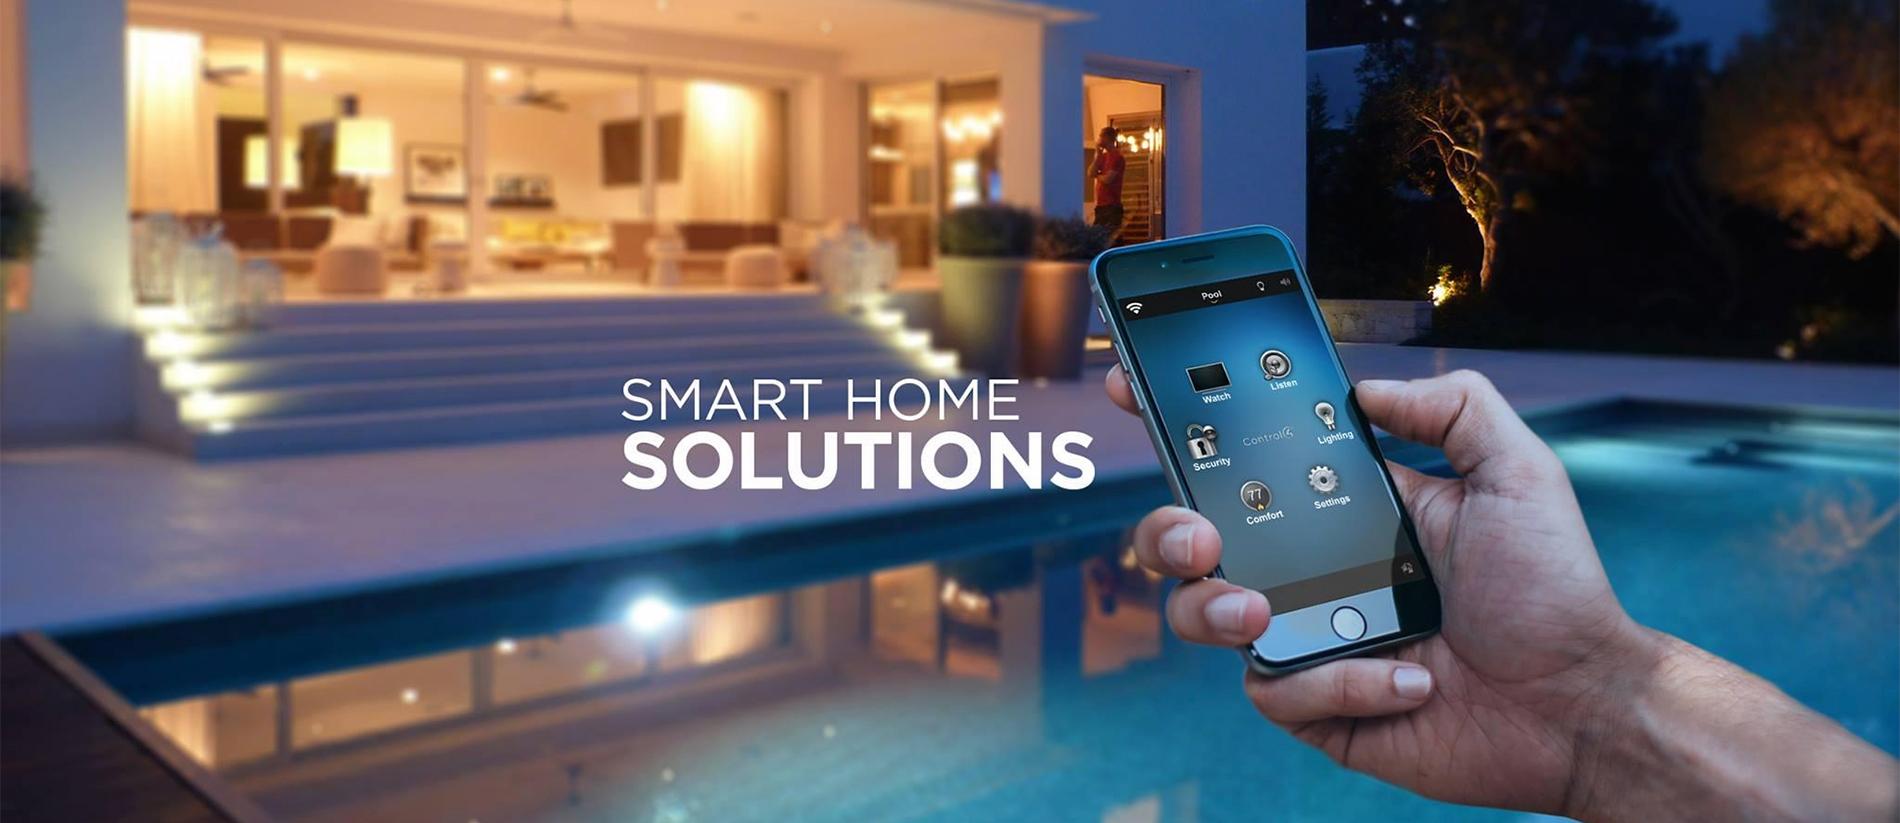 control4_solutions.jpg